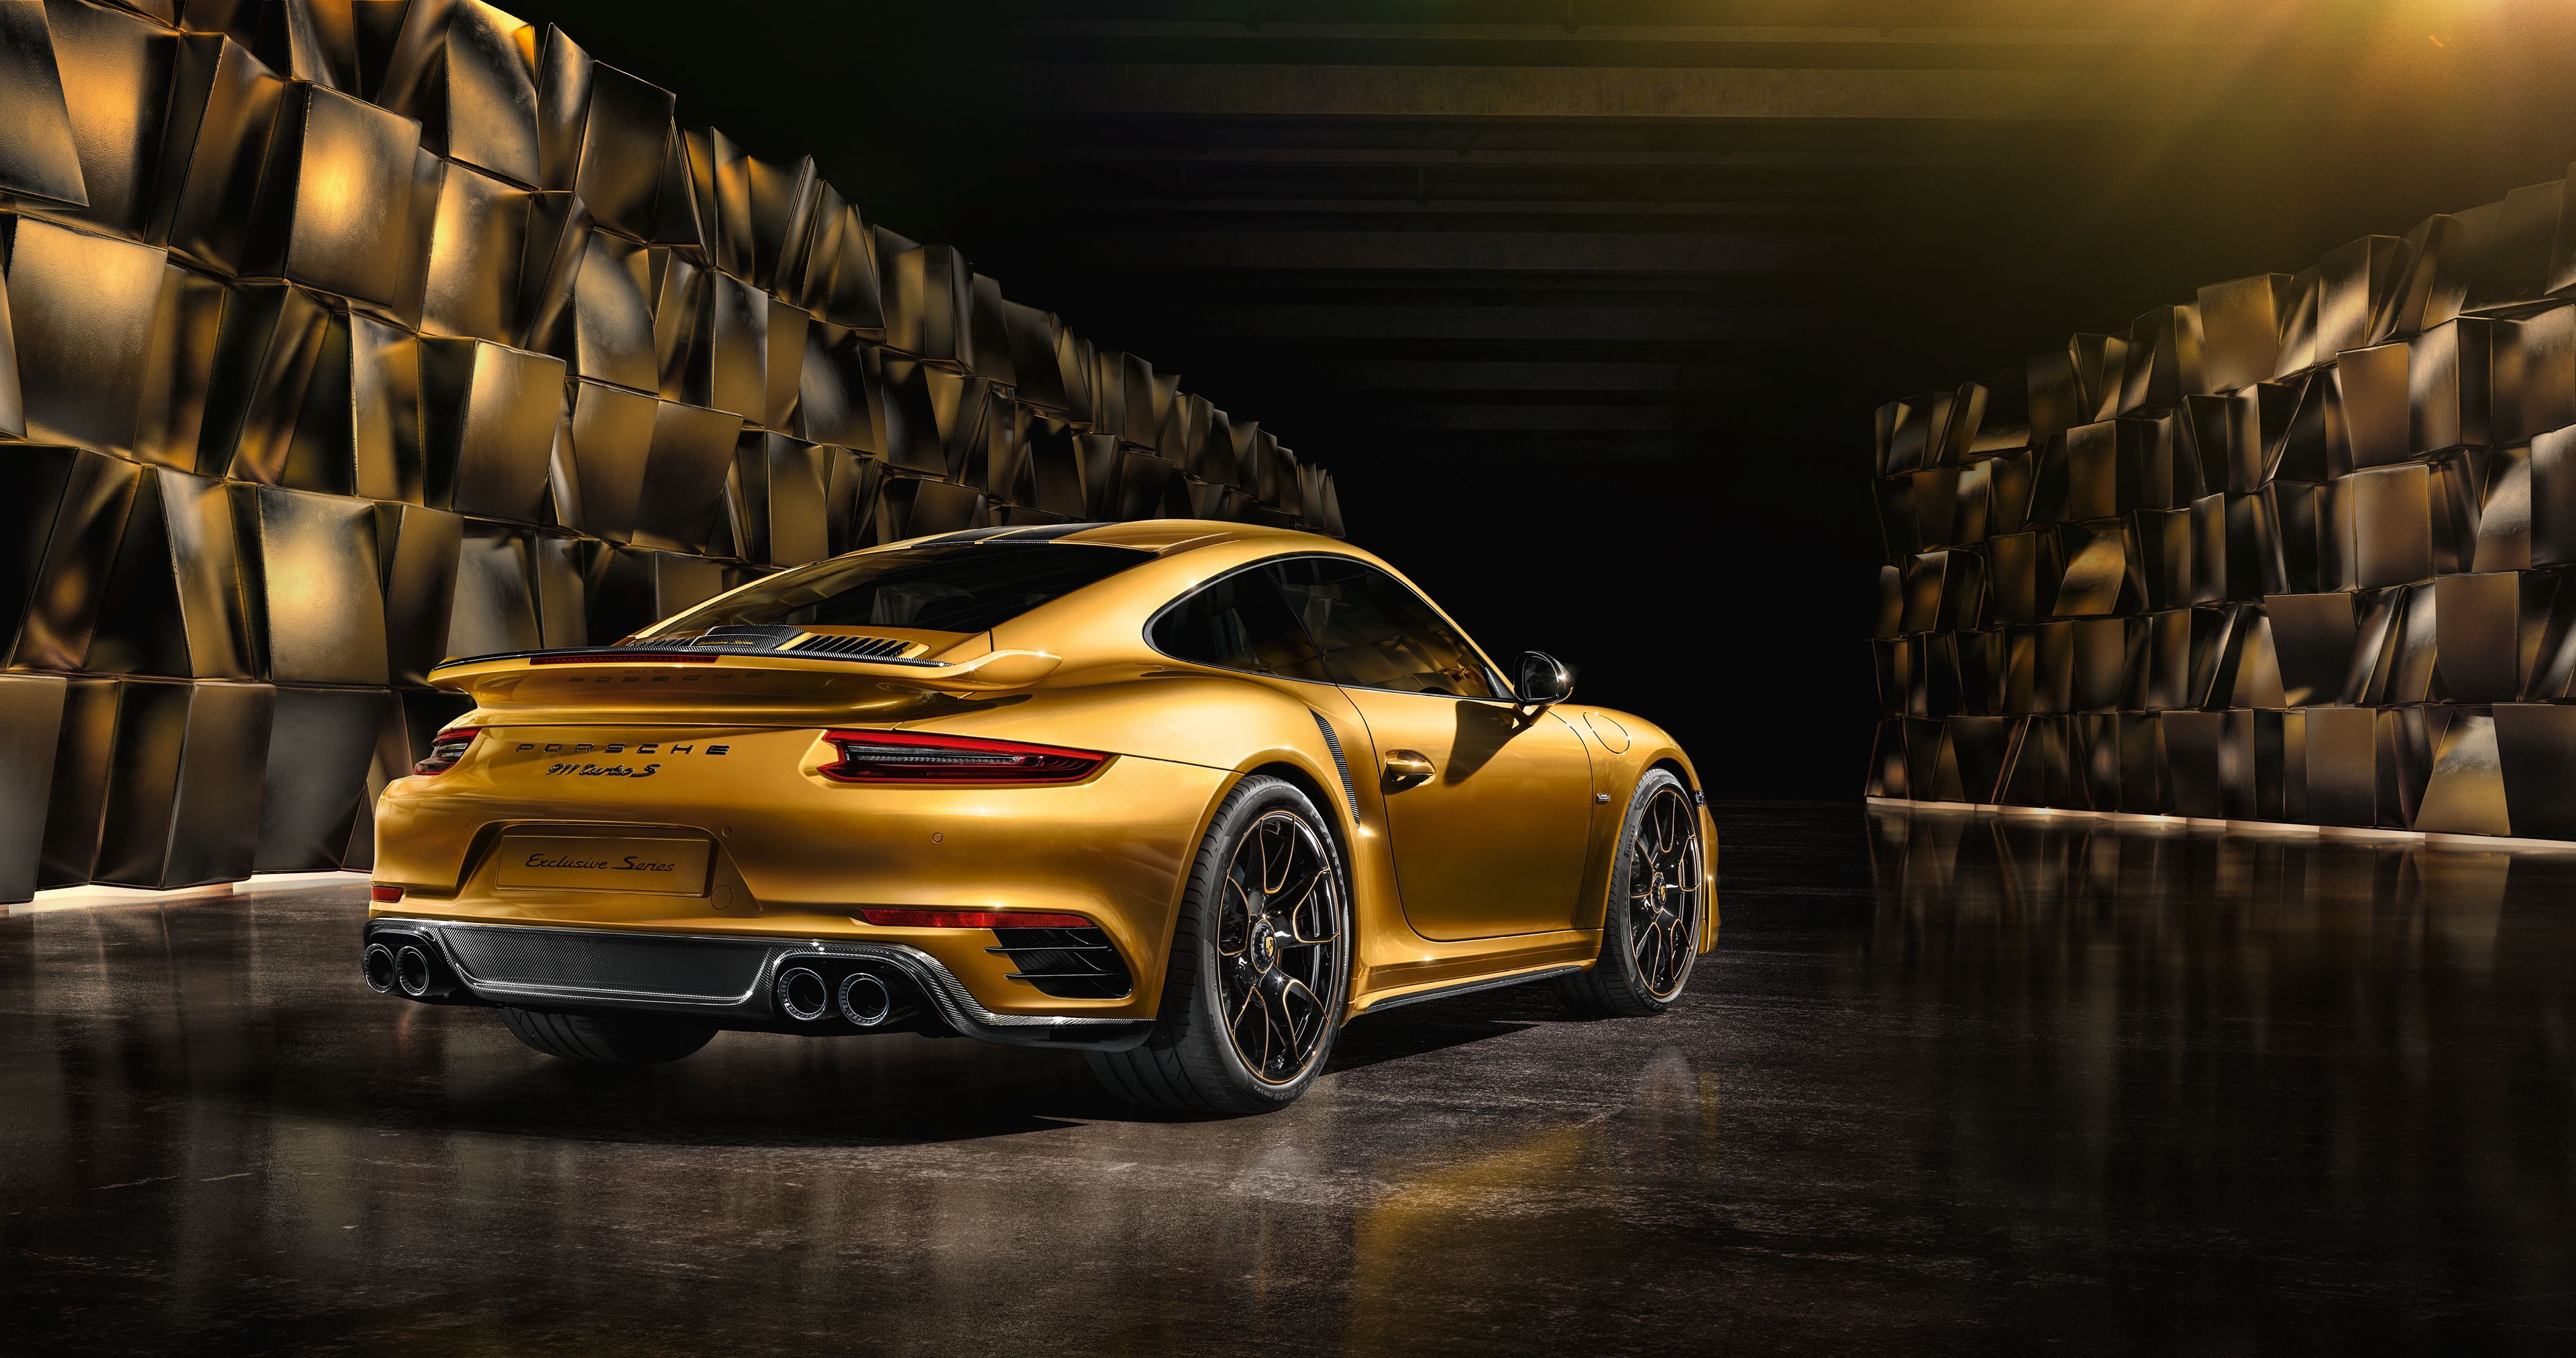 Porsche 911 Turbo Wallpapers Top Free Porsche 911 Turbo Backgrounds Wallpaperaccess